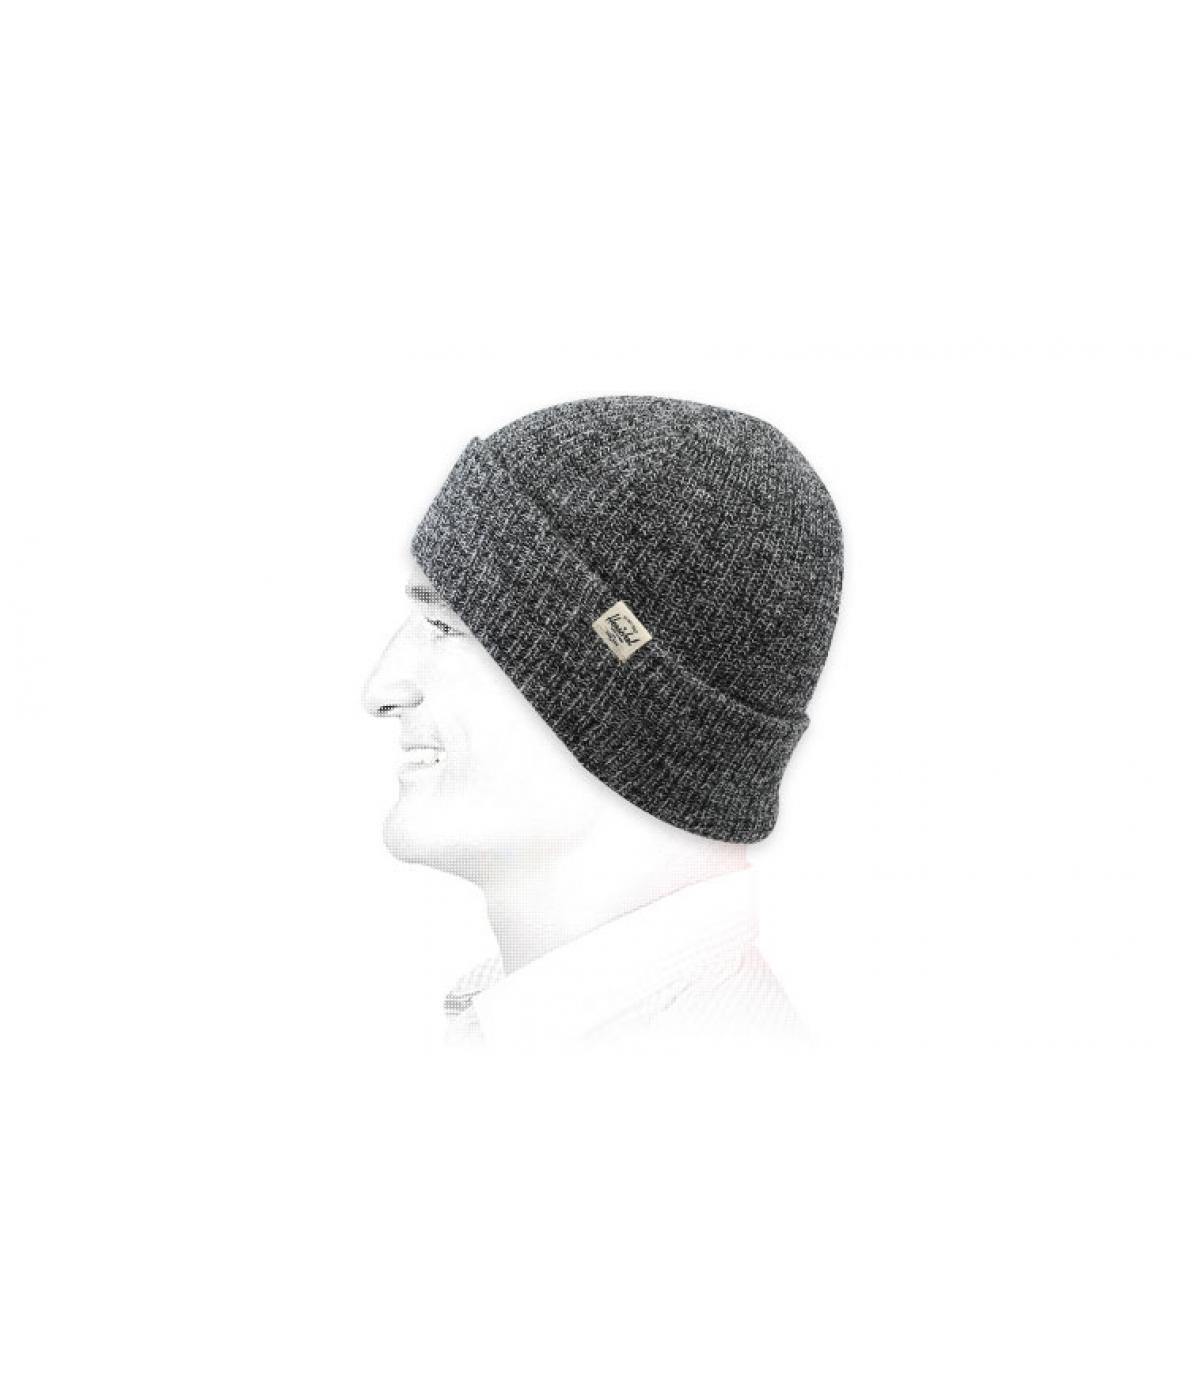 Cappellino Herschel grigio con risvolto